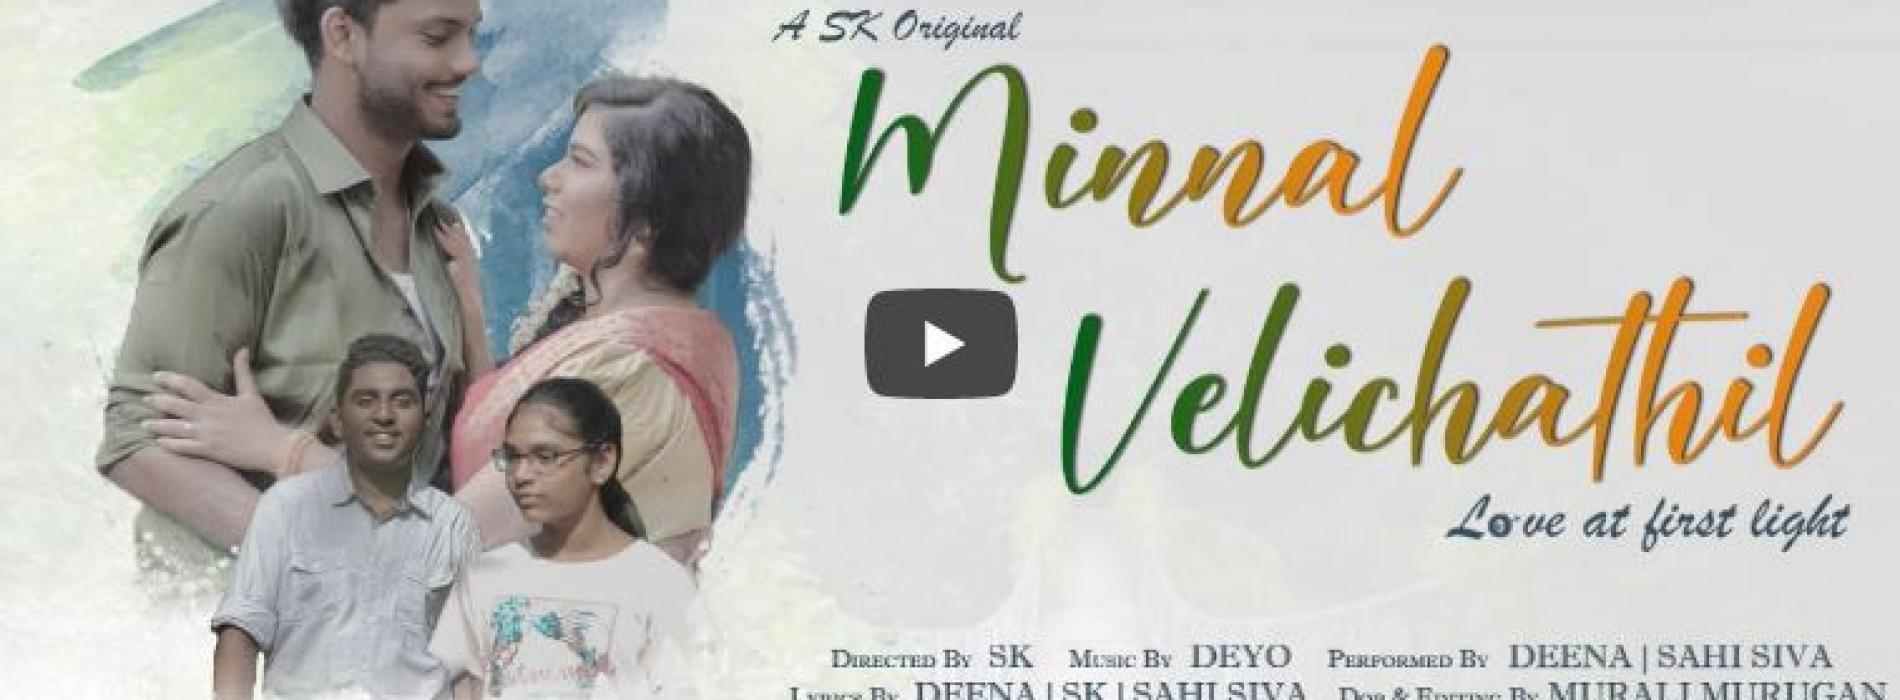 Minnal Velichathil Video – Deena & SK ft Sahi Siva (A DEYO Musical) Pillai Productions – Haaran